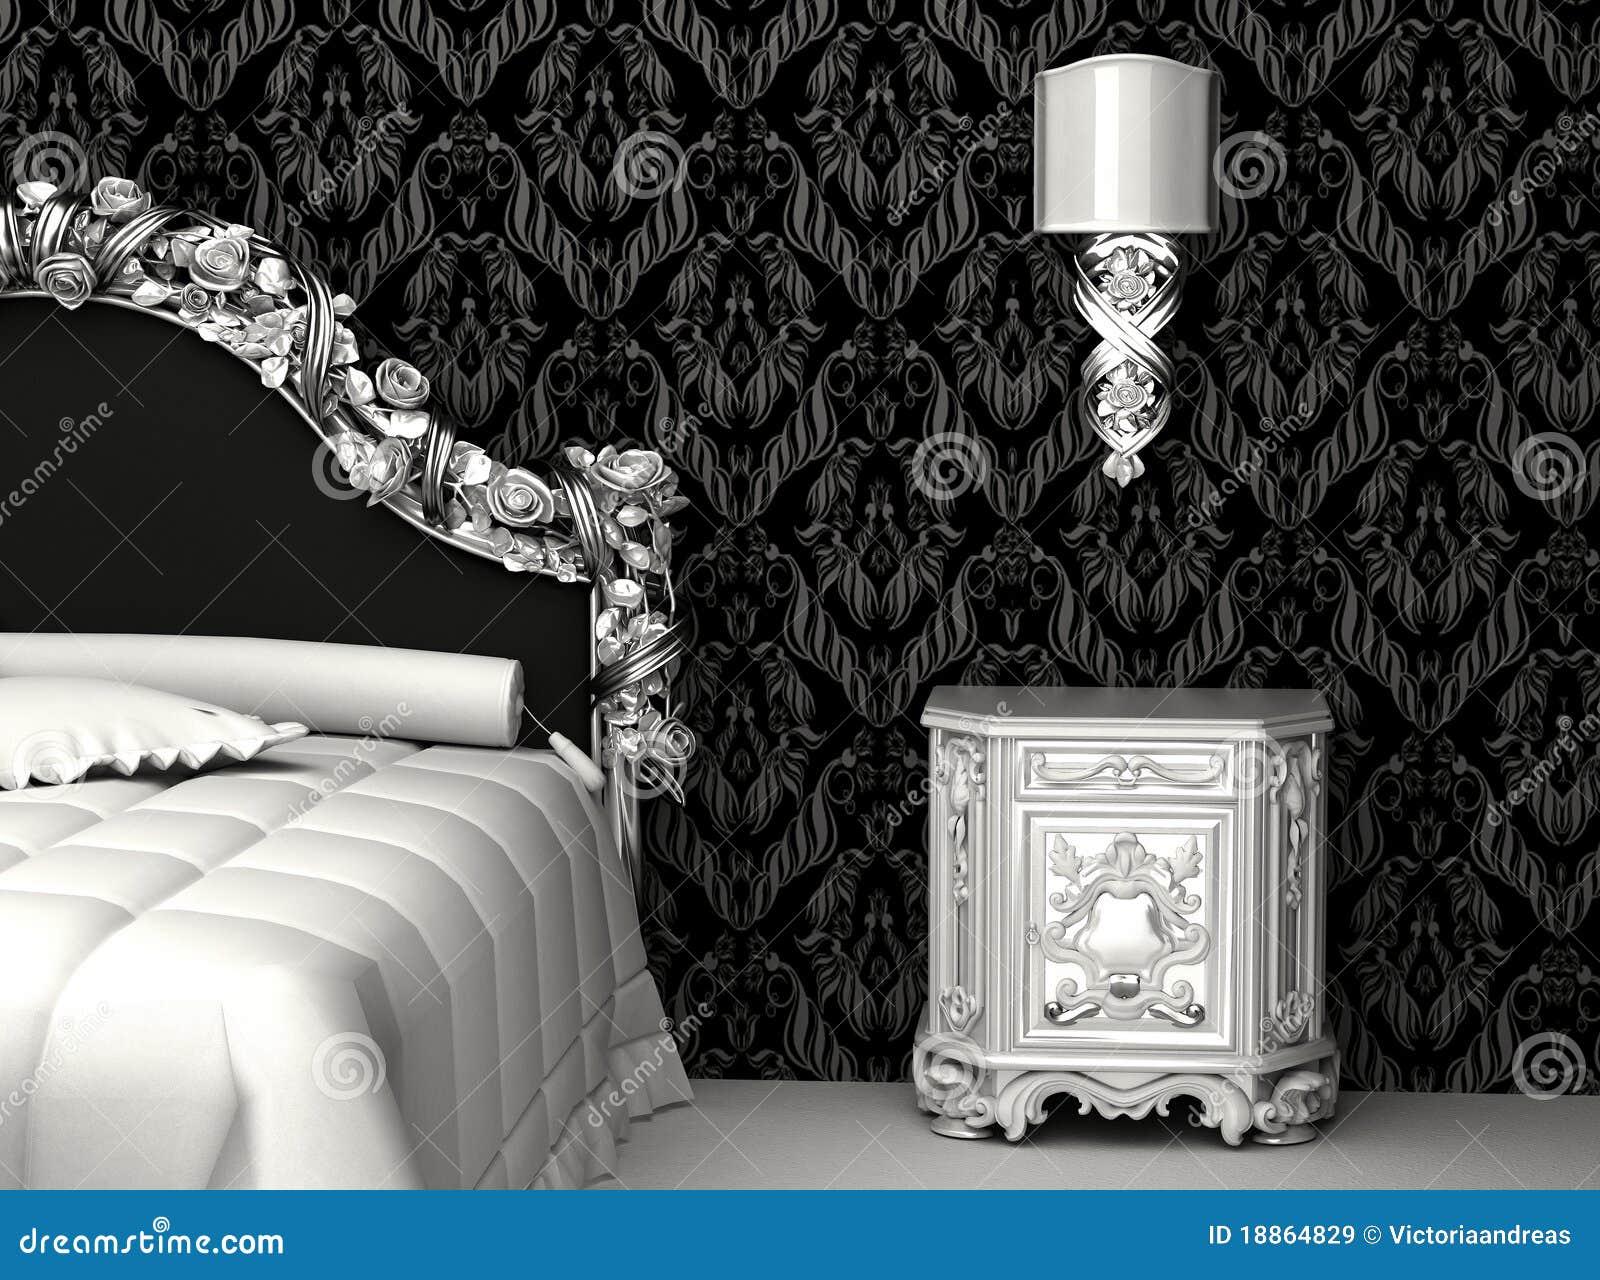 barok behang slaapkamer ~ lactate for ., Deco ideeën